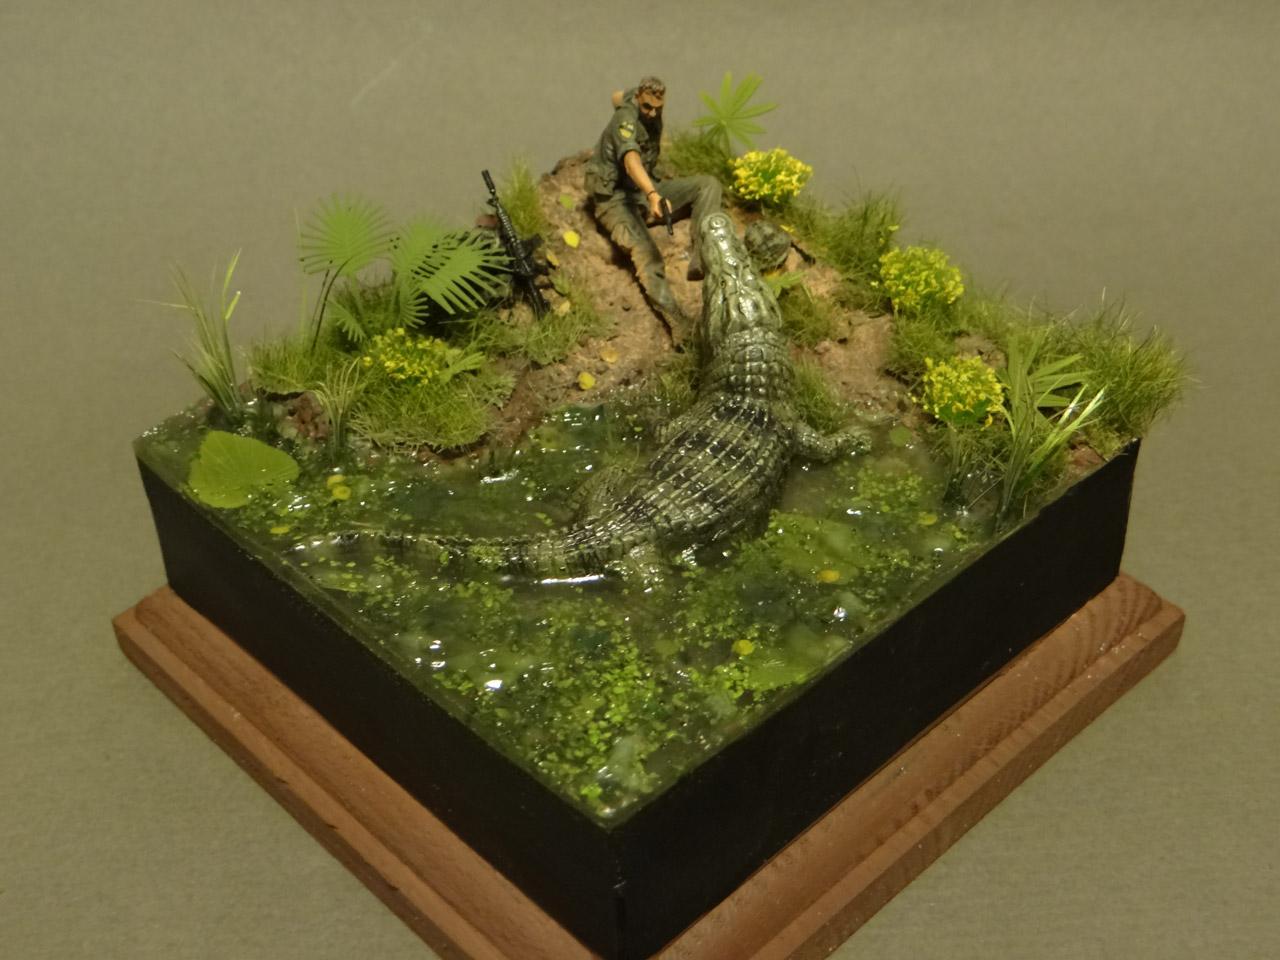 Dioramas and Vignettes: Wild world, photo #1